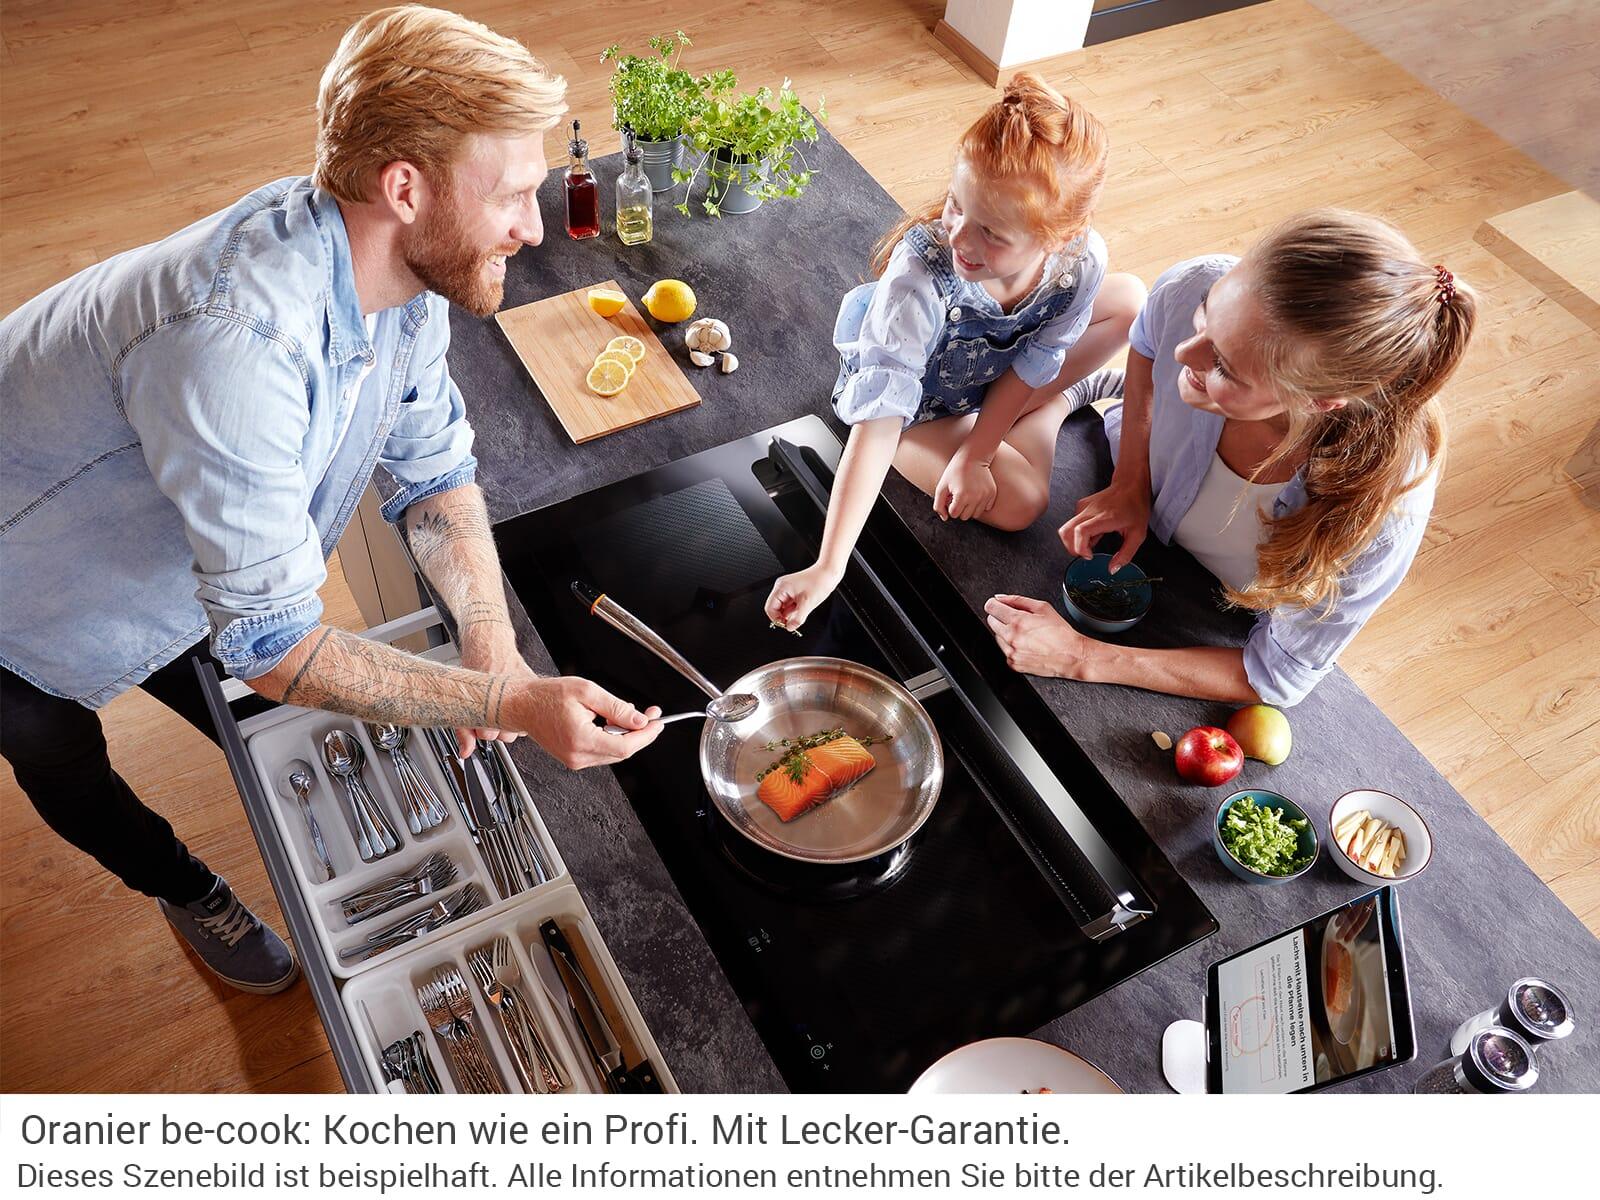 Oranier kfl 2094 be cook 2094 76 induktionskochfeld dunstabzug